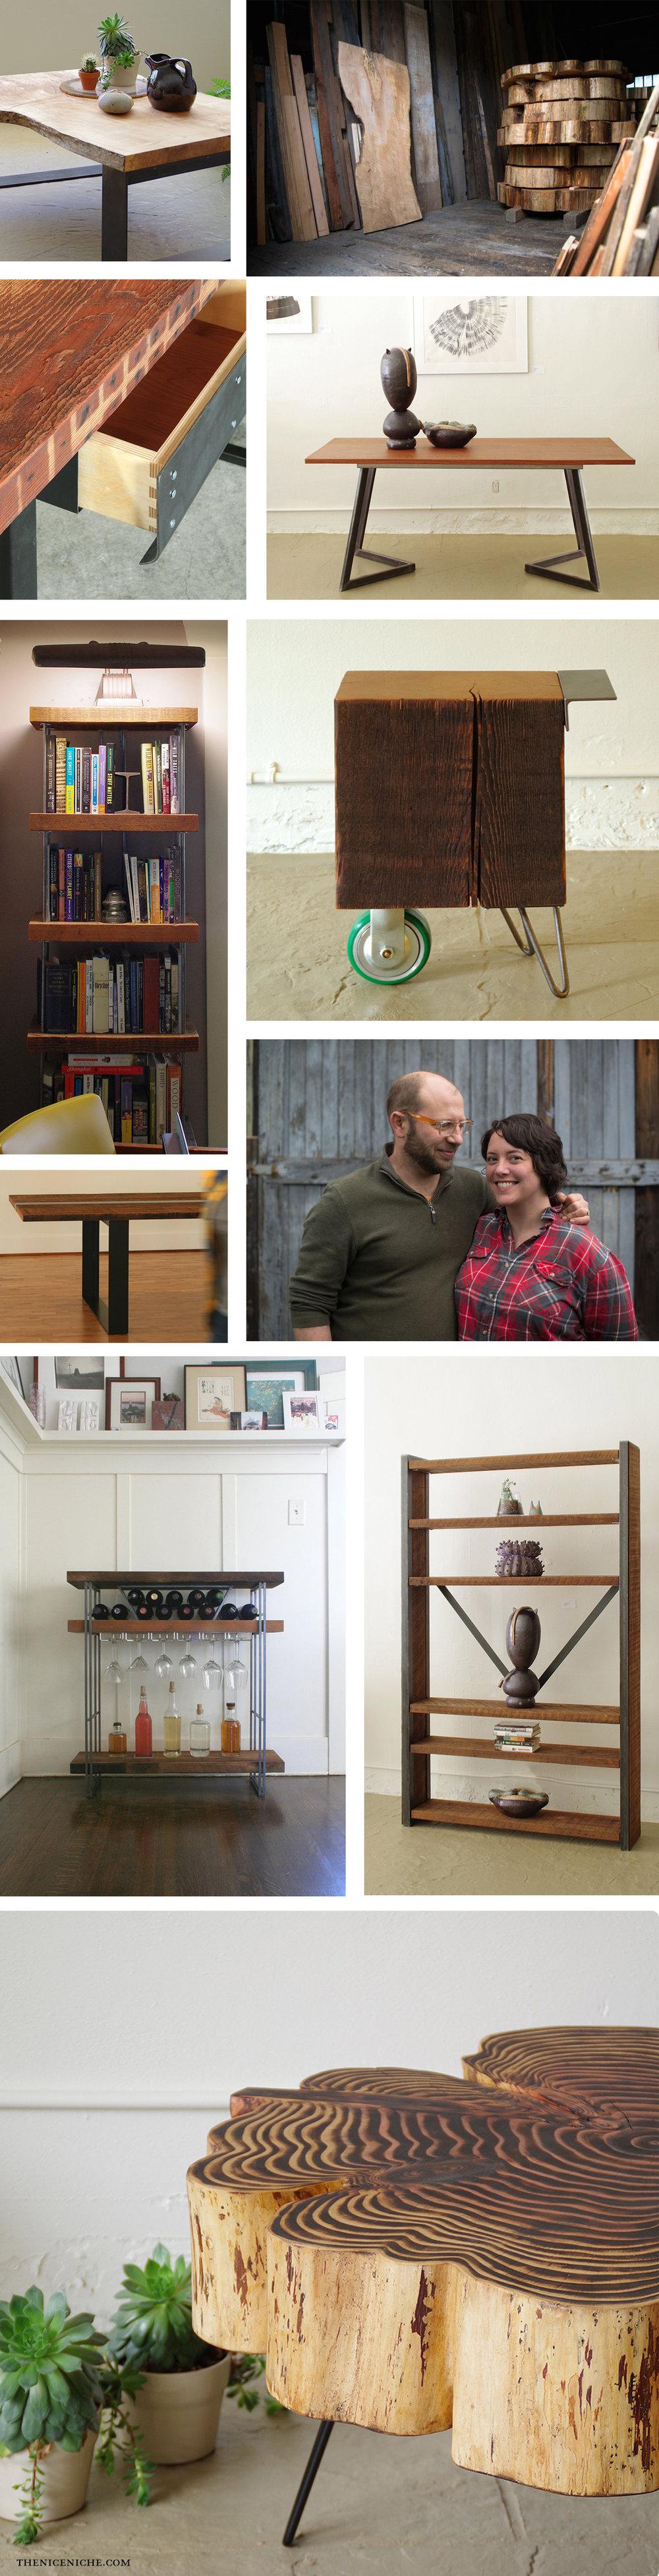 Interior Design — The Nice Niche